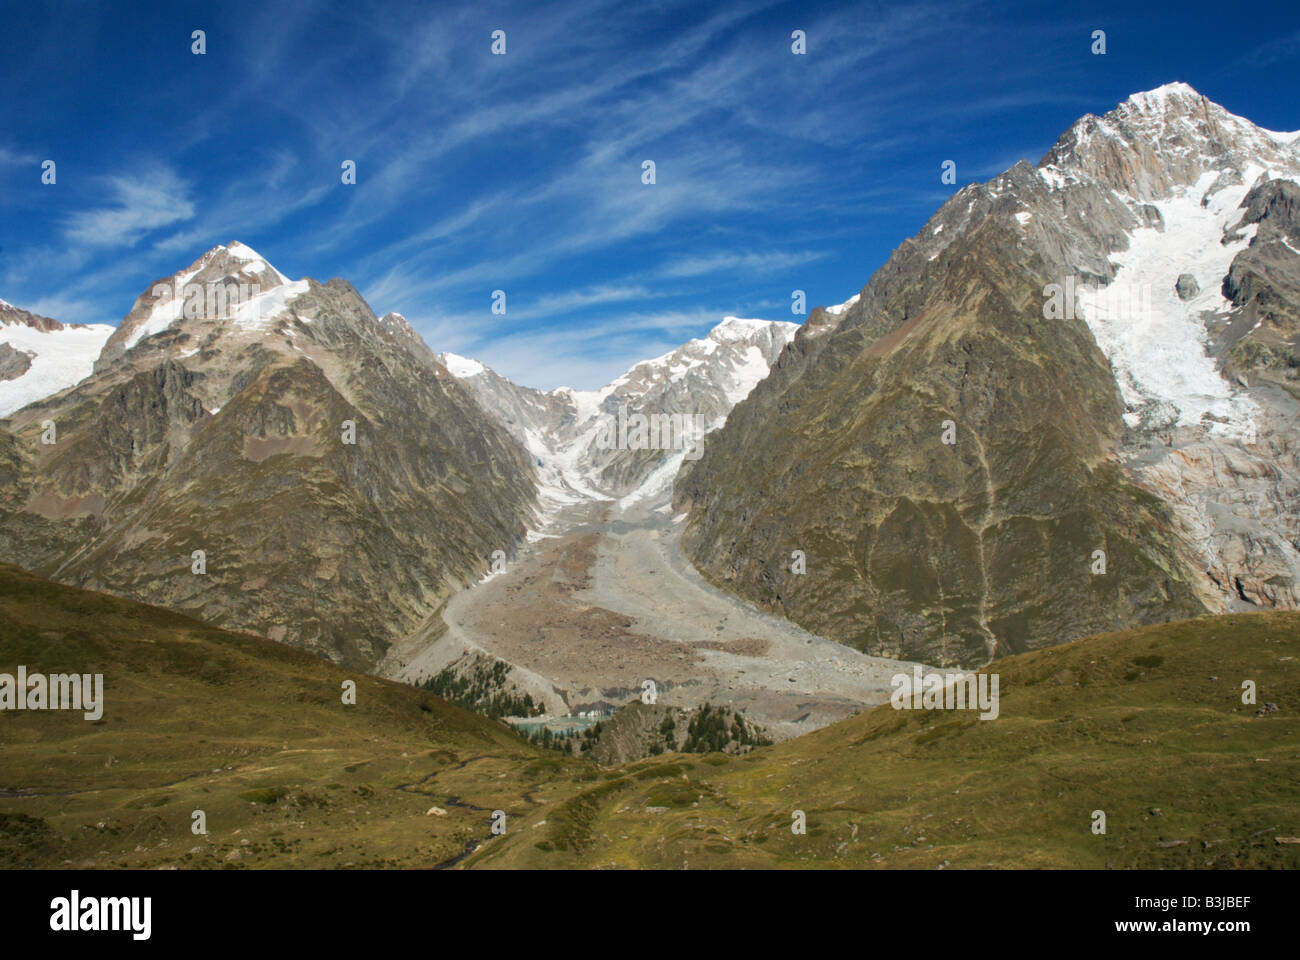 The Glacier du Miage, Mont Blanc Massif, above the Val Veny, Italian Alps. - Stock Image